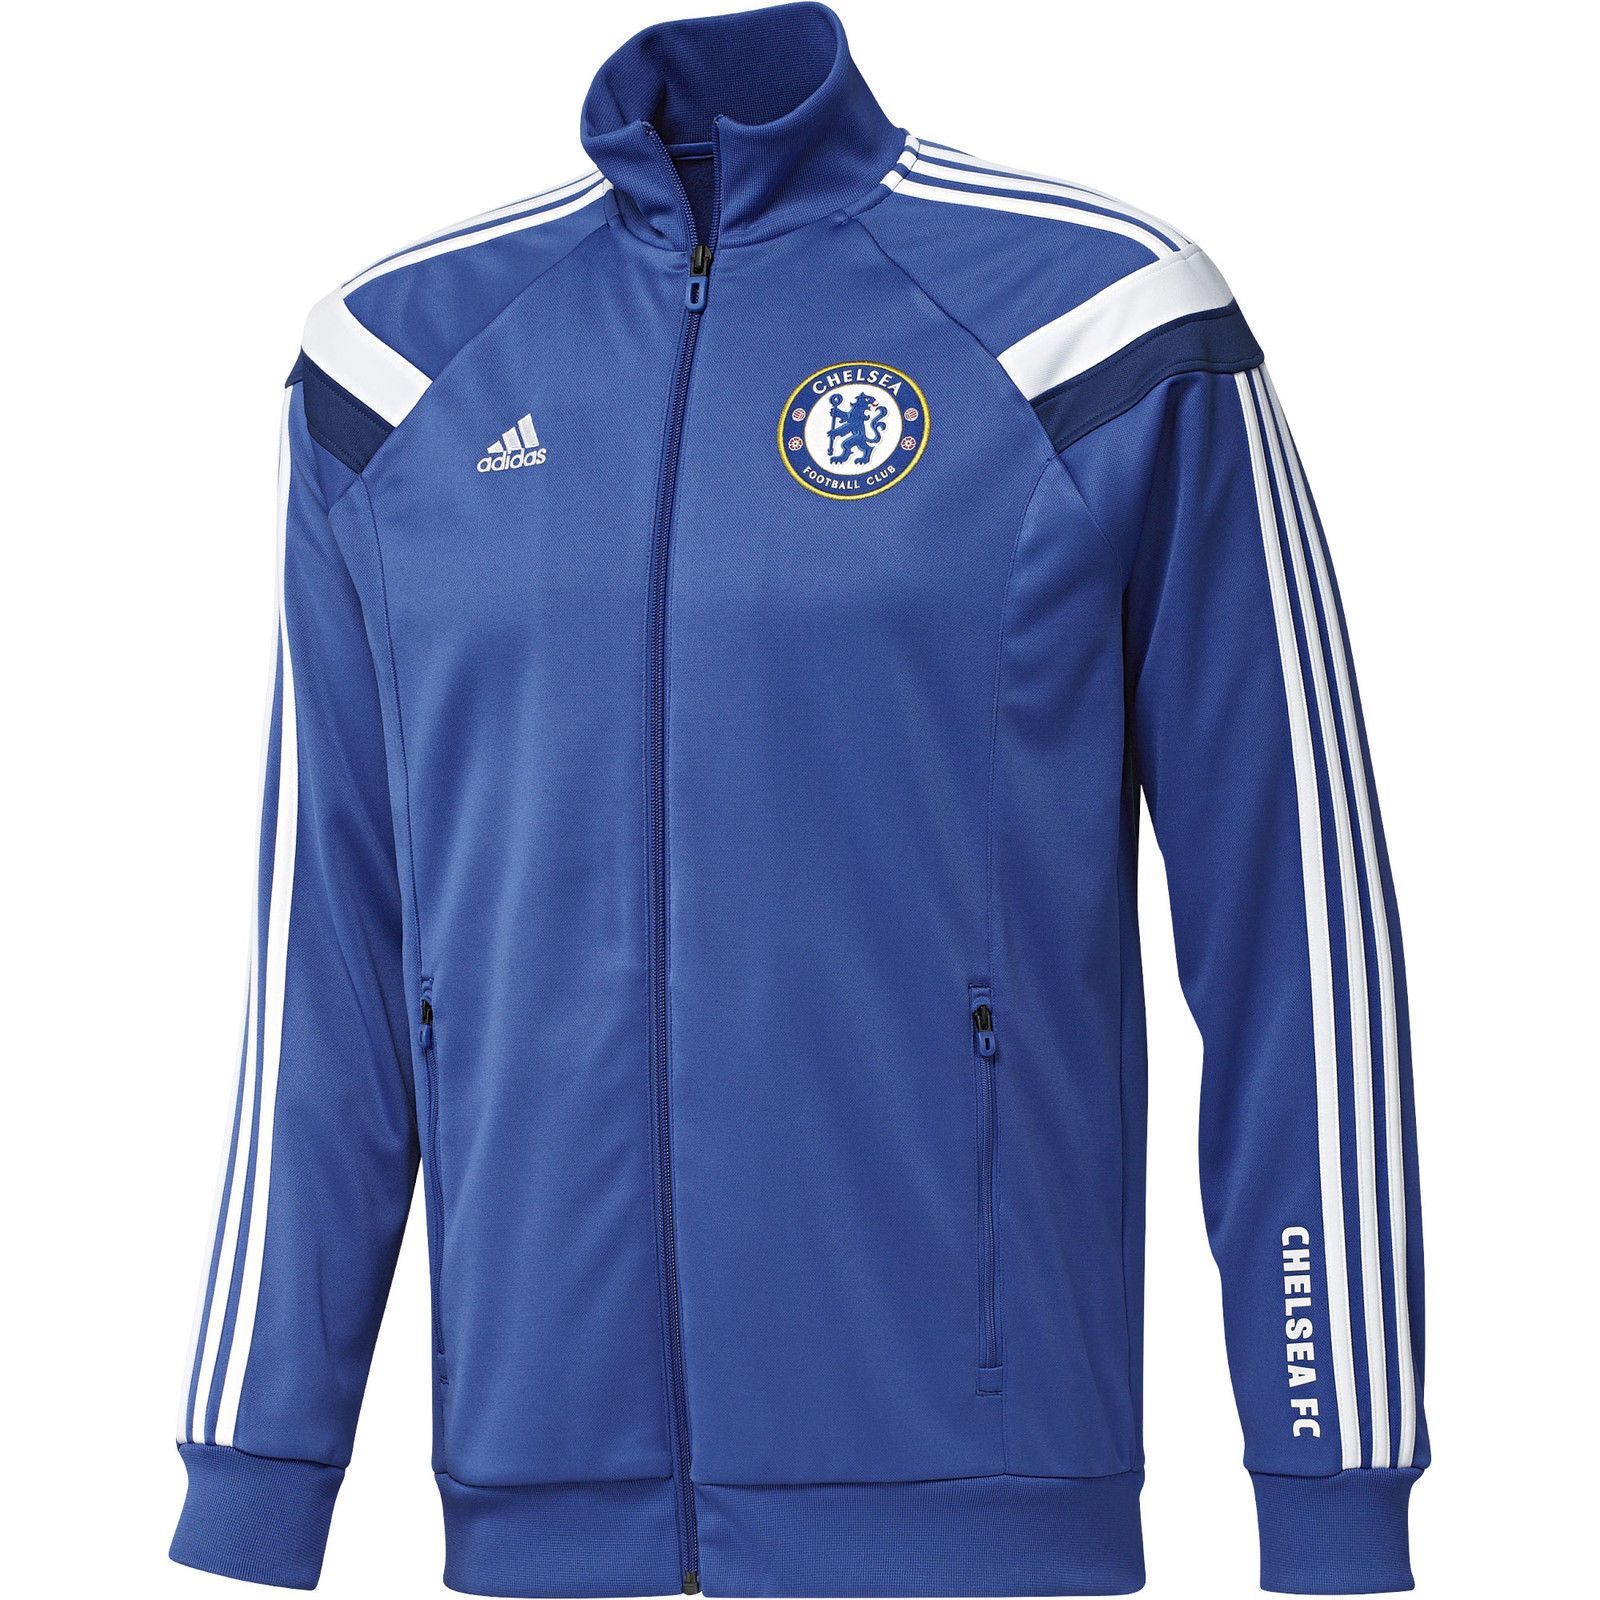 Adidas Chelsea FC Himno Chaqueta Chándal Azul blancoo